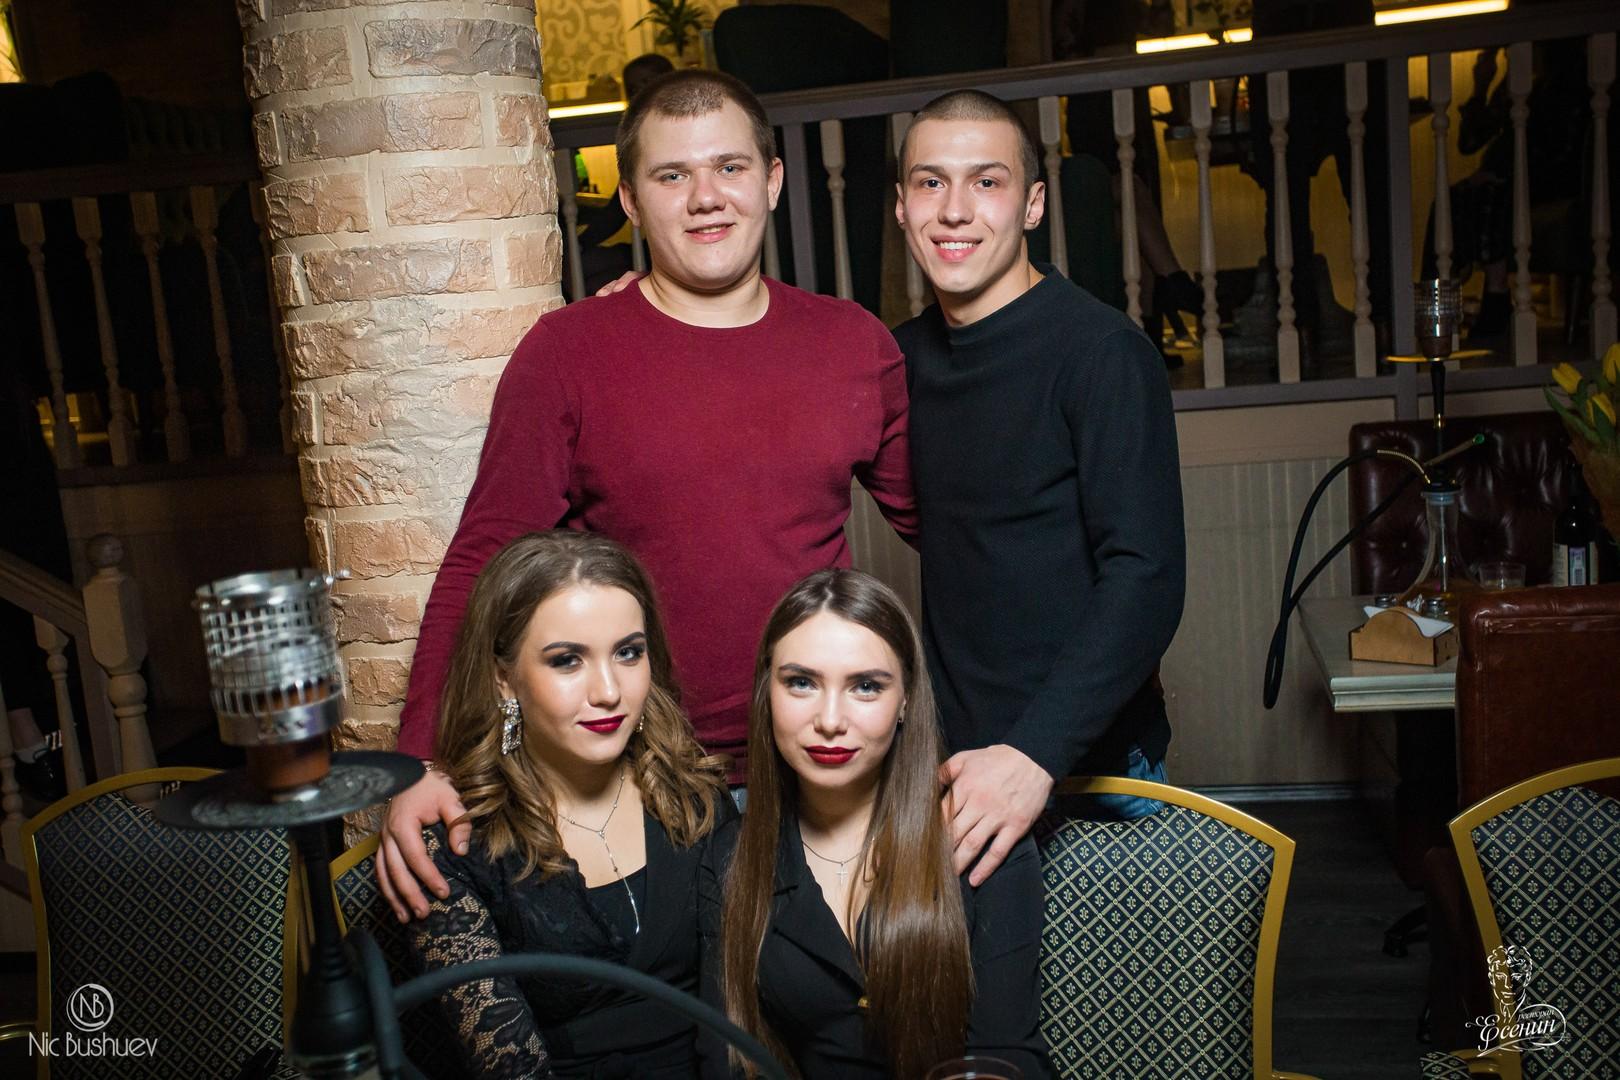 Ресторан Орехово-Зуево Есенин 08_03_2020 (33)